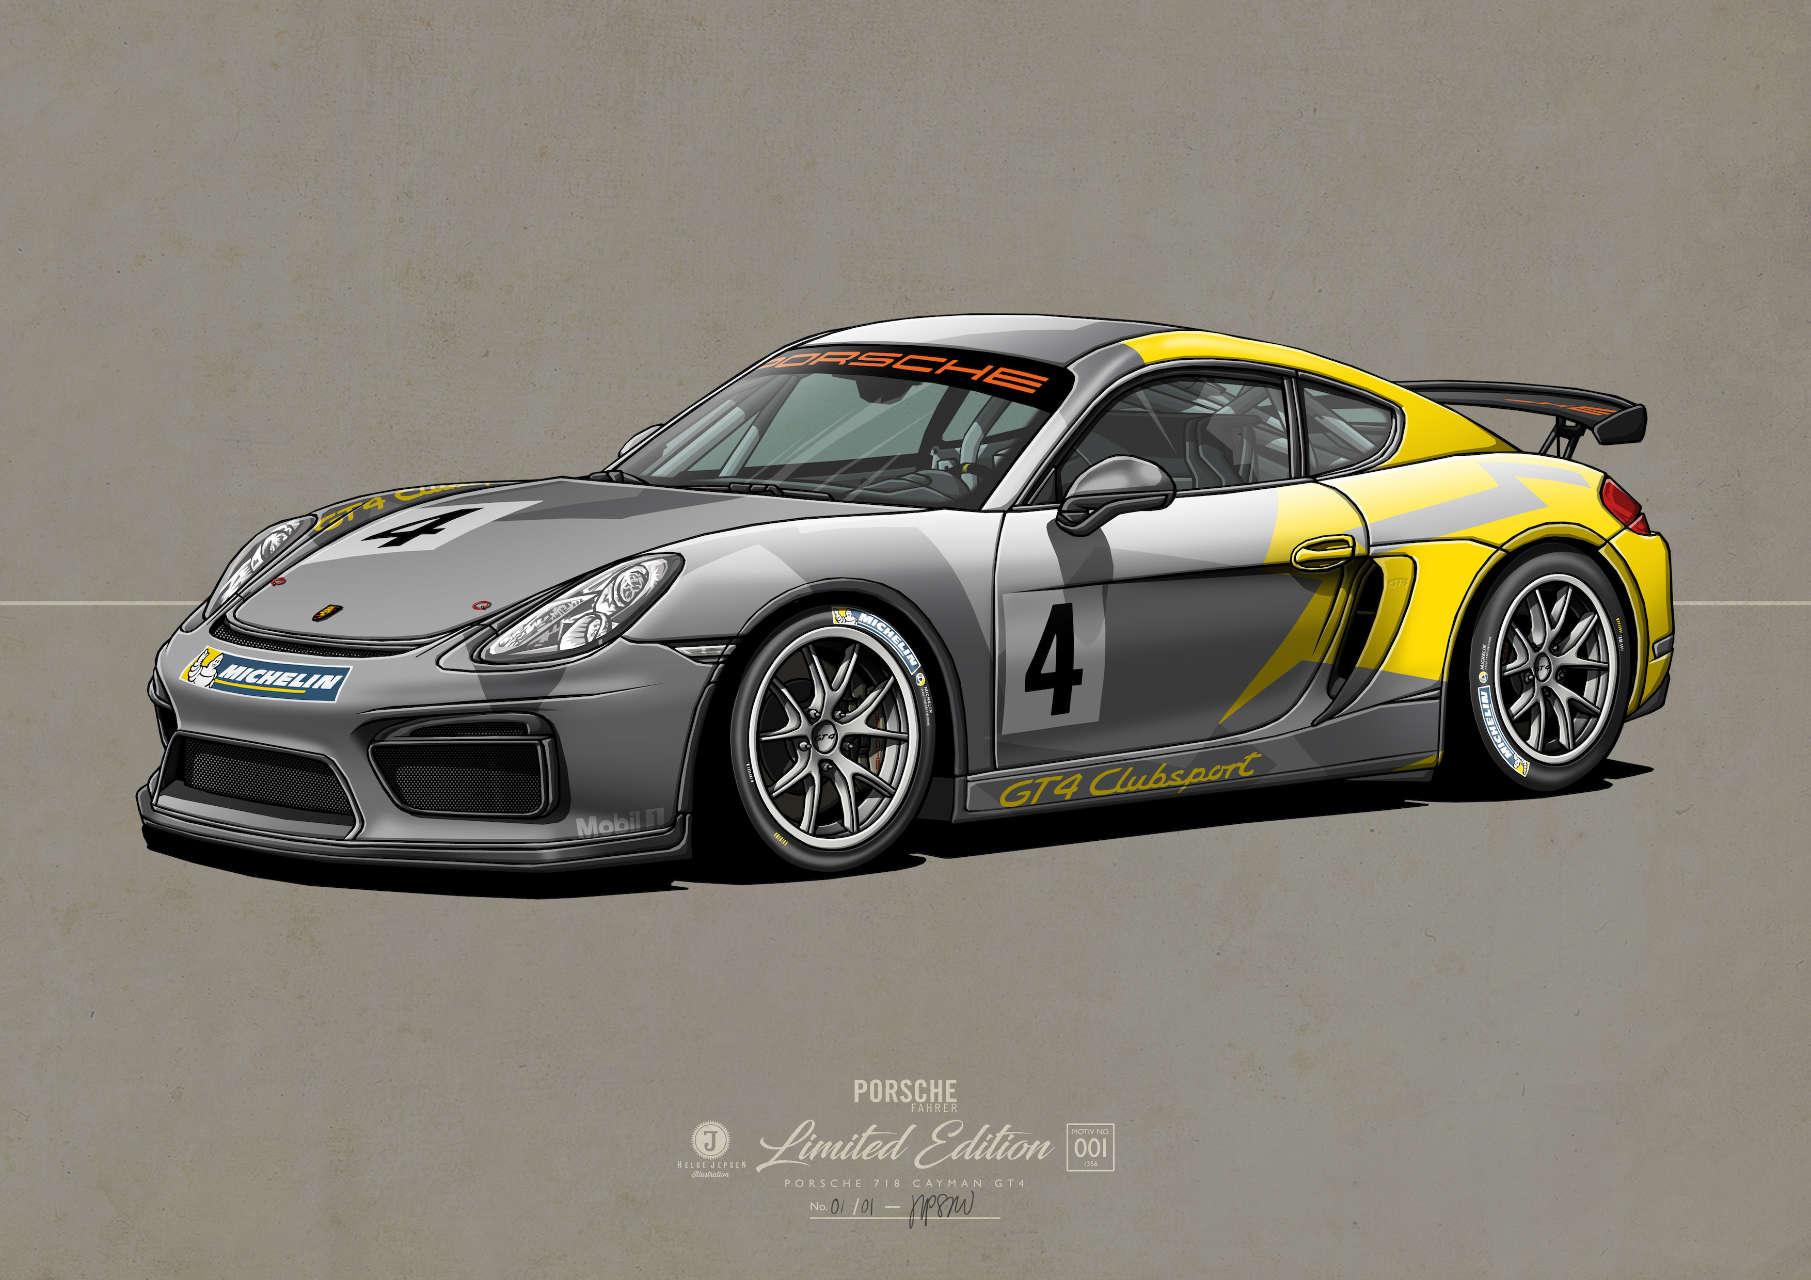 Porsche 718 Cayman GT4 Kunstwerk